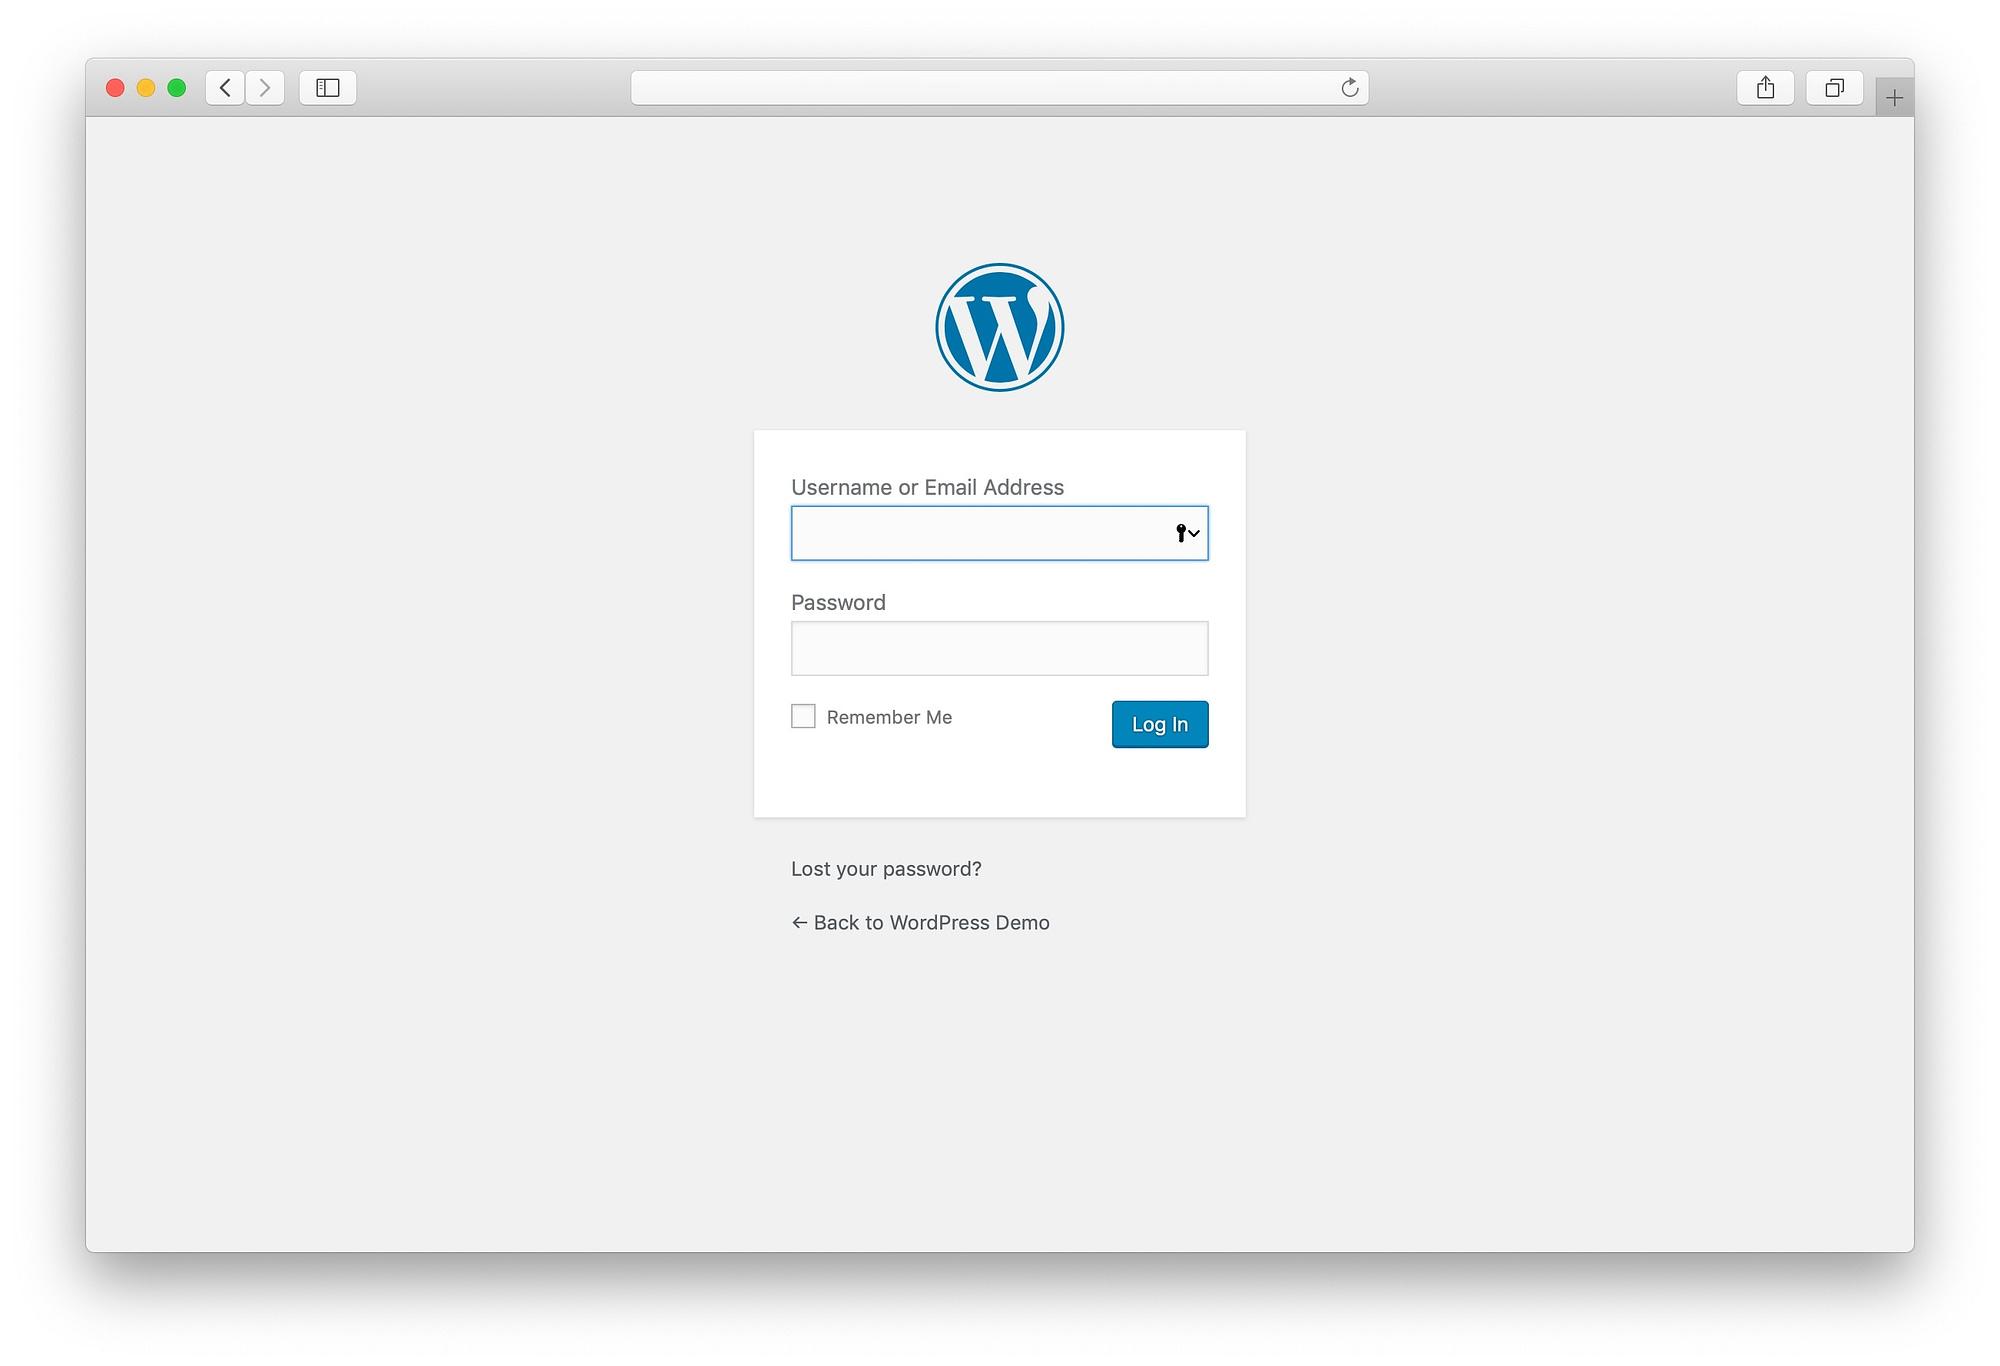 WordPress 5.0 login